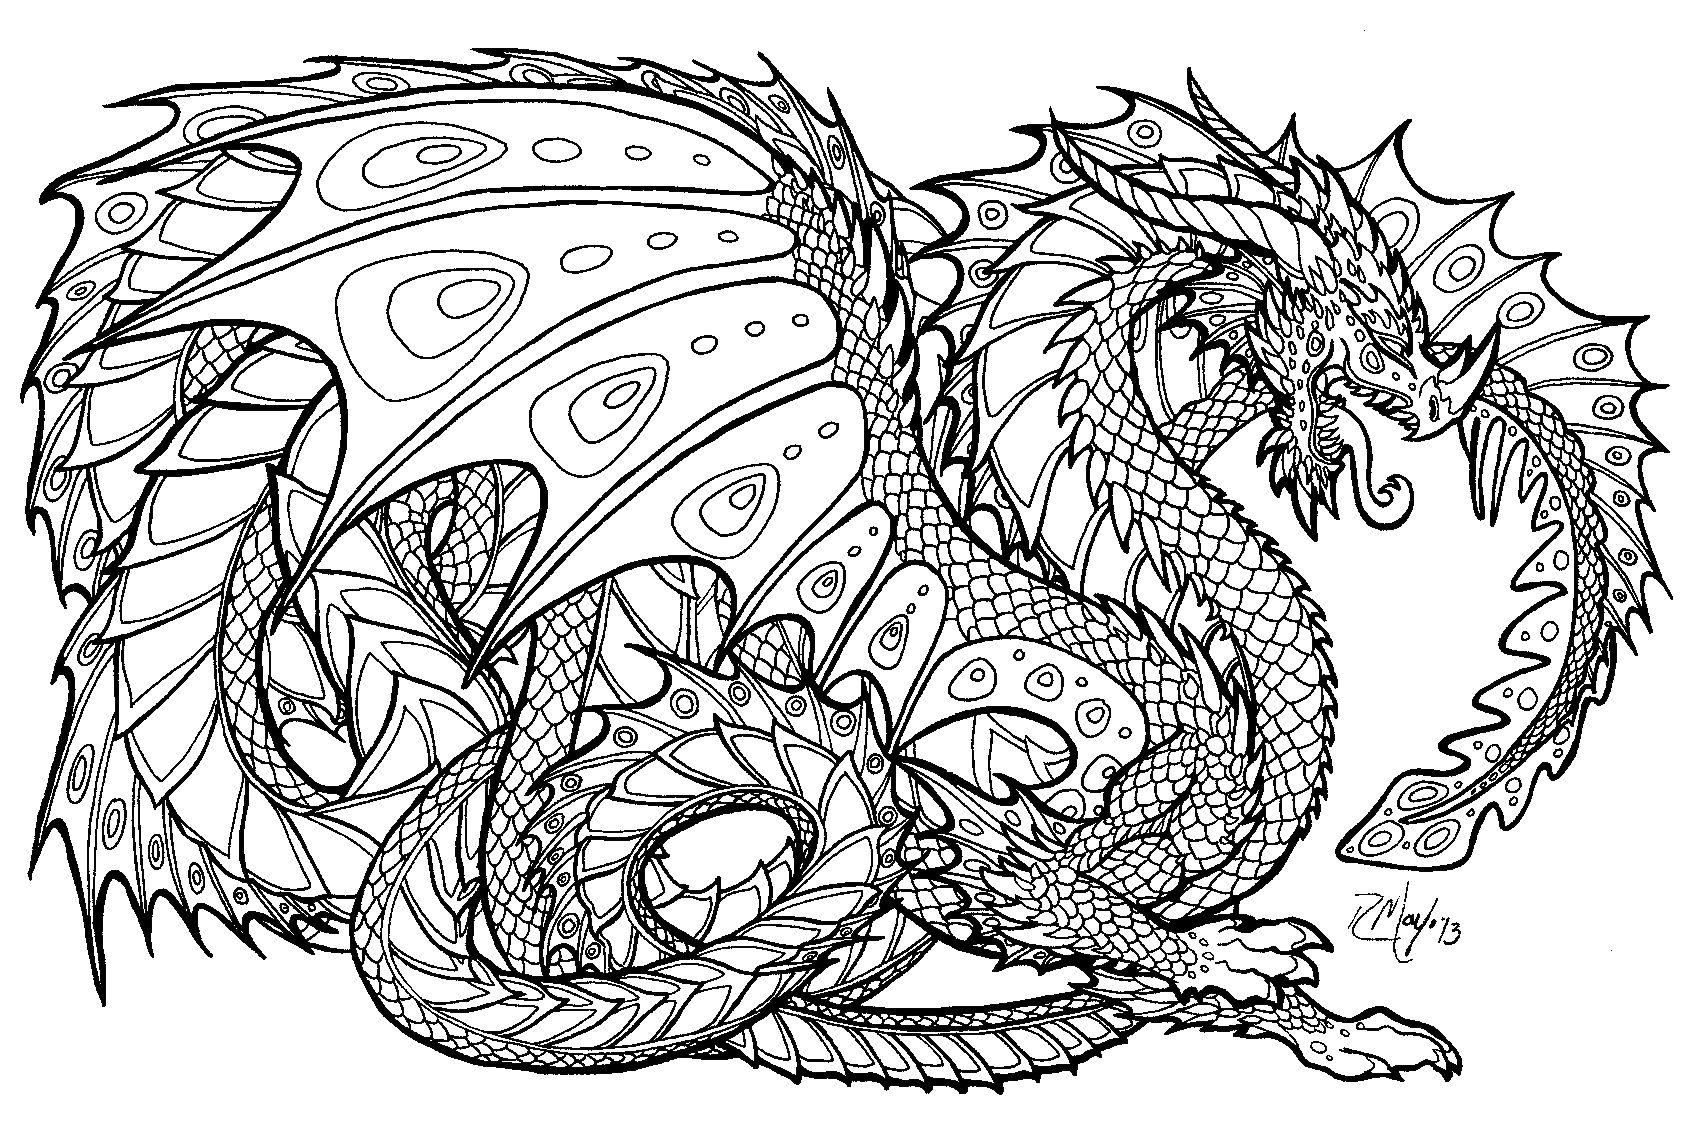 dragon coloring page skylanders dragons coloring pages team colors coloring page dragon